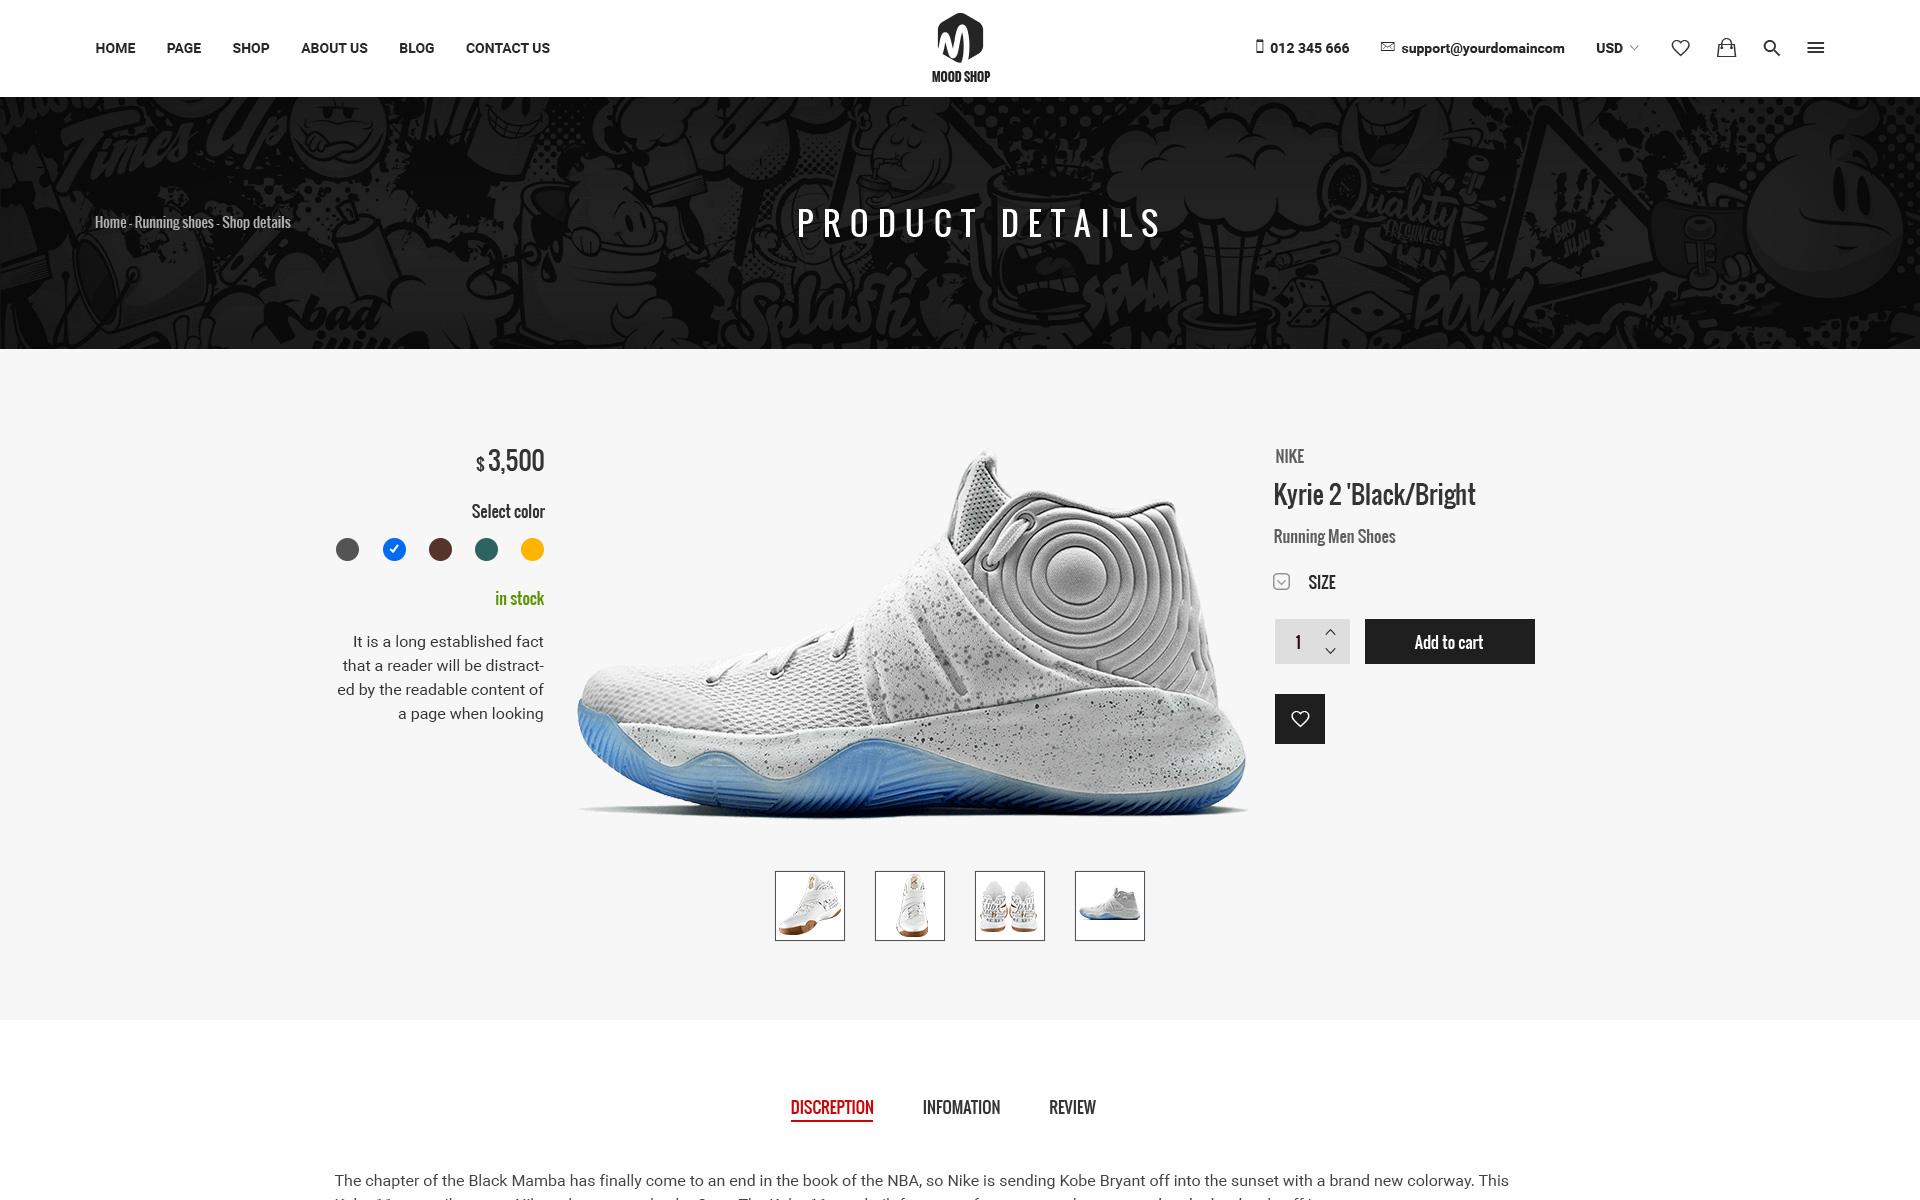 Moodshop - Modern eCommerce Footwear Online Store PSD Template Big Screenshot